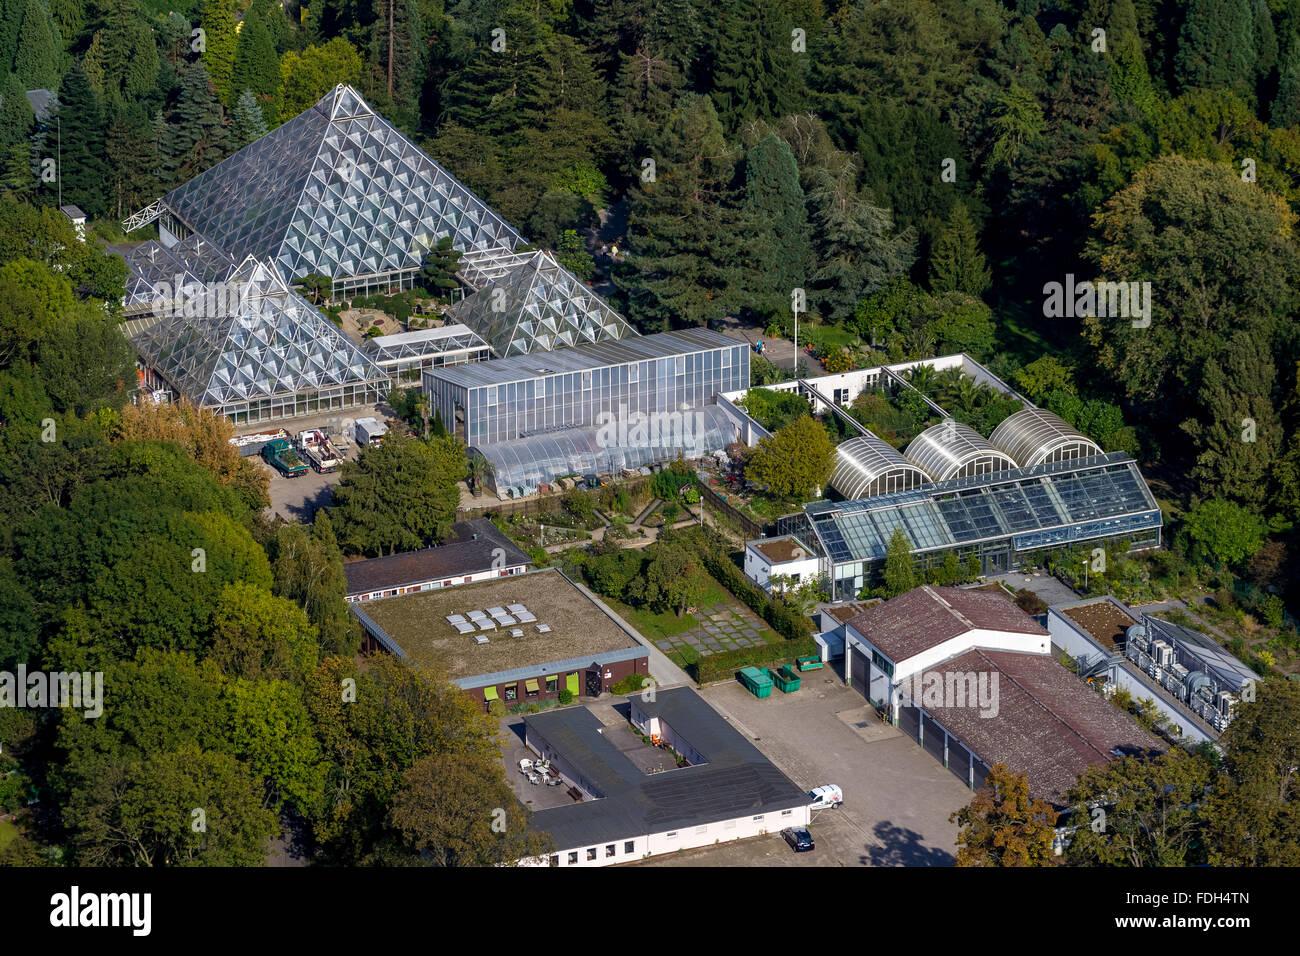 aerial view grugapark essen rain forest house botanical gardens stock photo 94419381 alamy. Black Bedroom Furniture Sets. Home Design Ideas